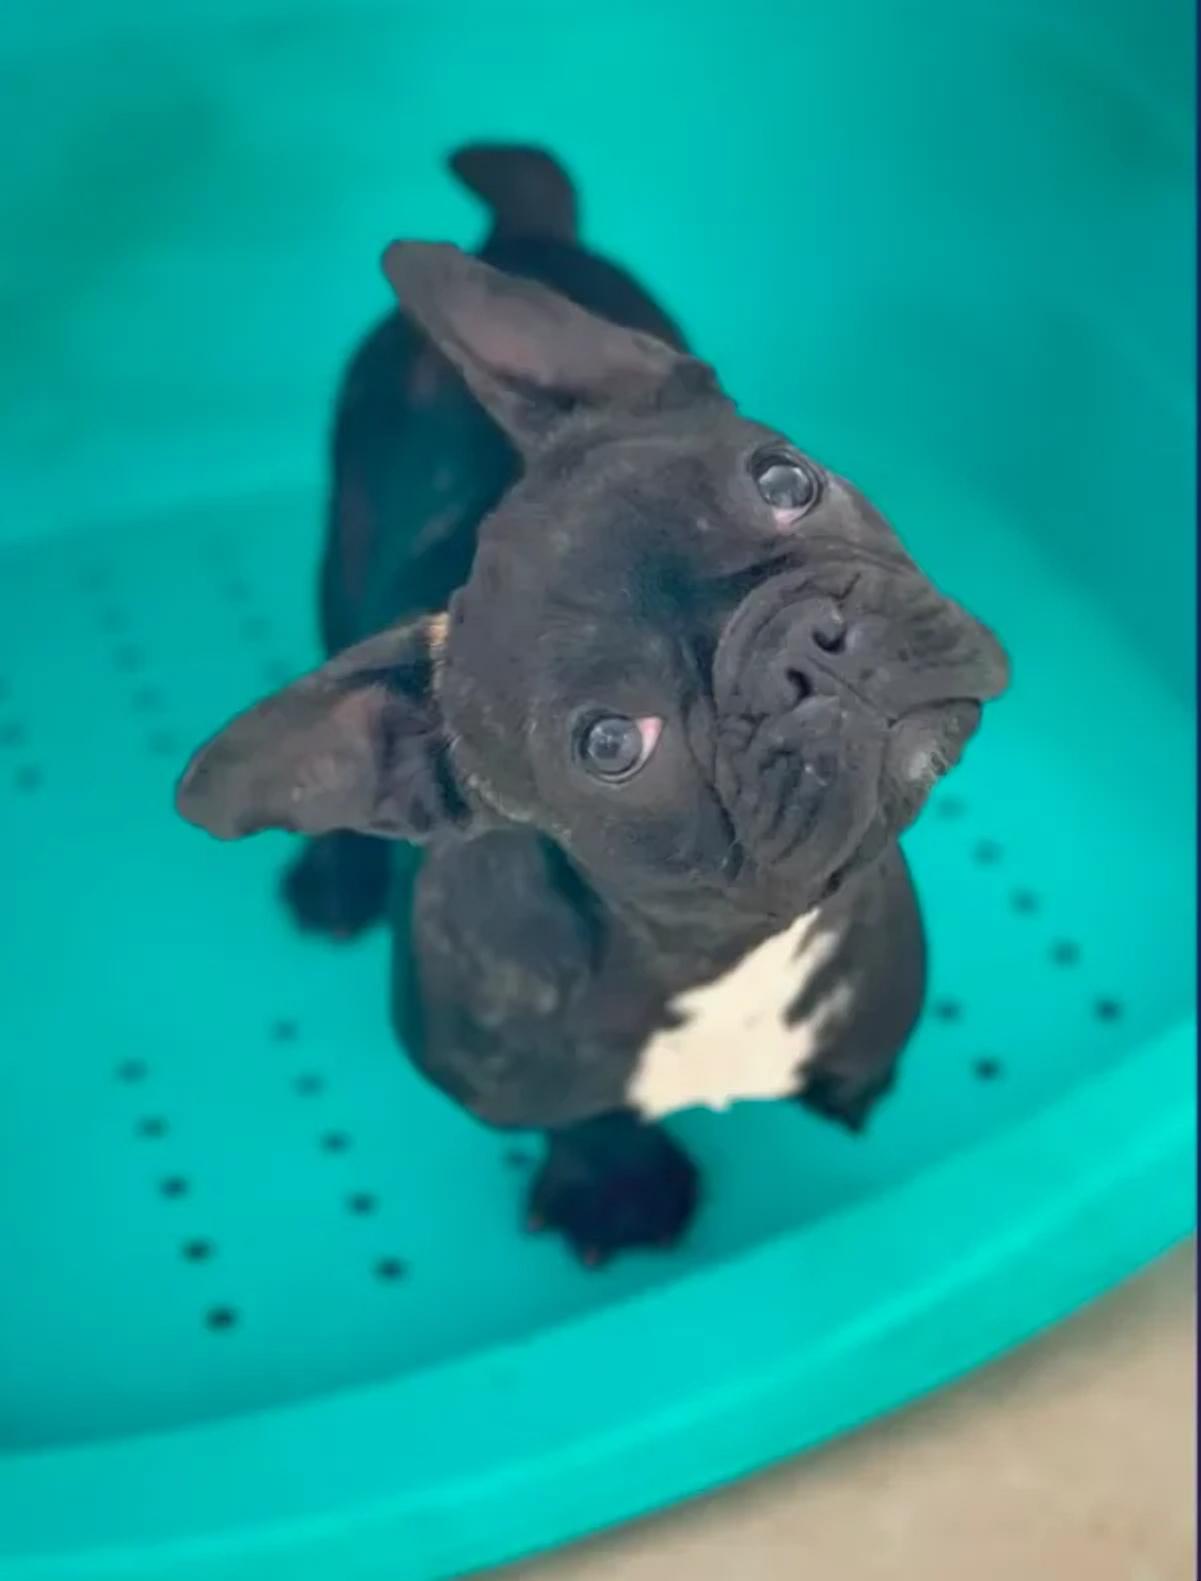 Фото: Adoption Day / The Dodo / YouTube